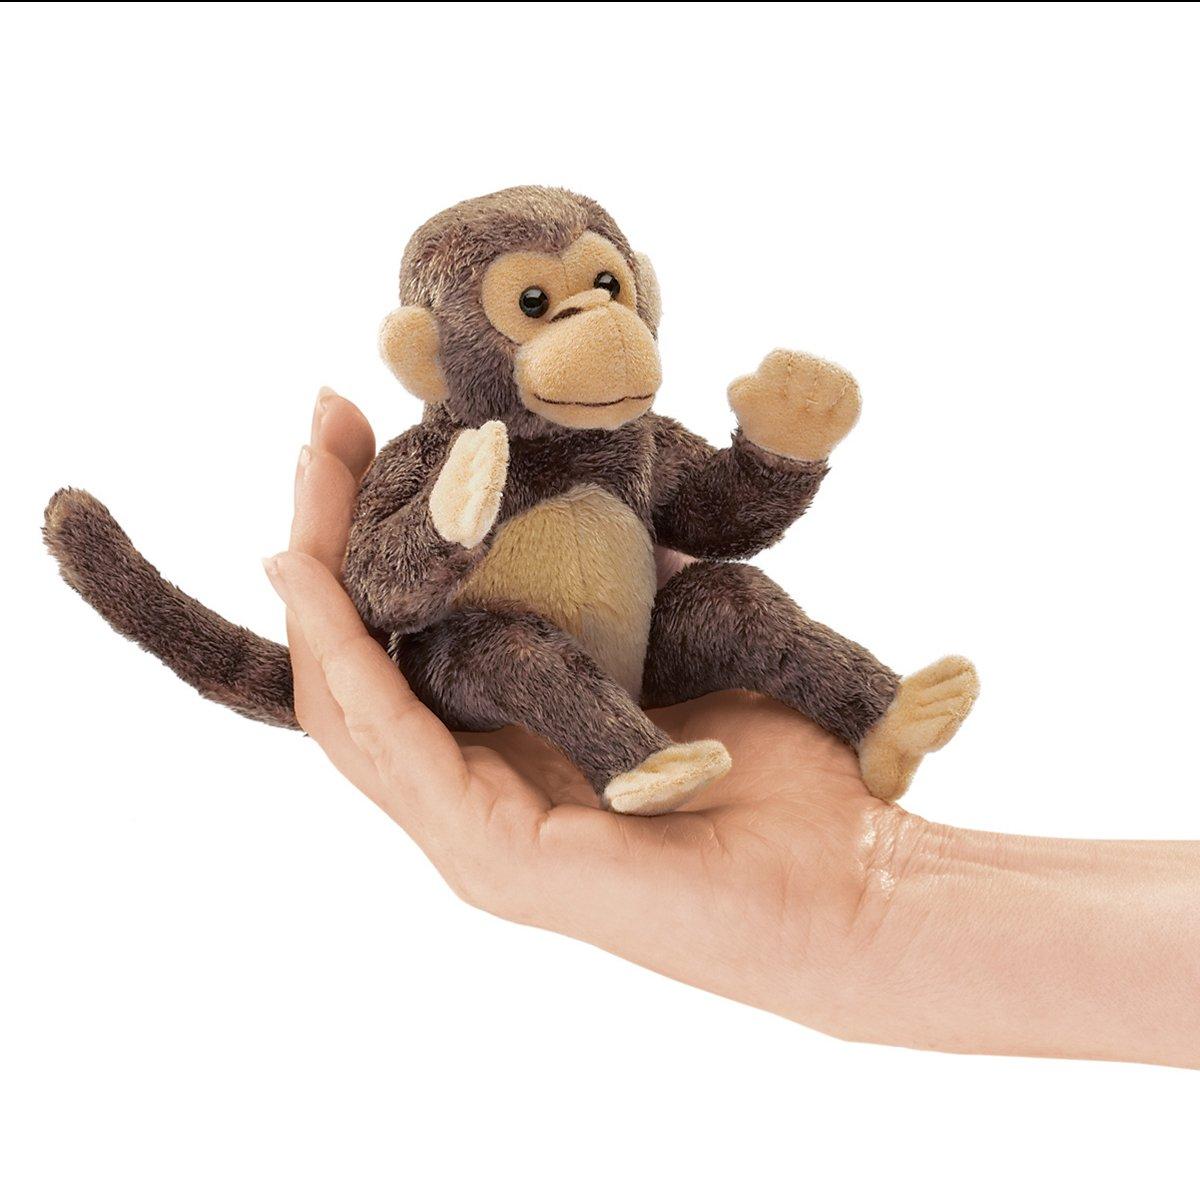 Folkmanis Mini Monkey Finger Puppet Folkmanis Puppets 2738